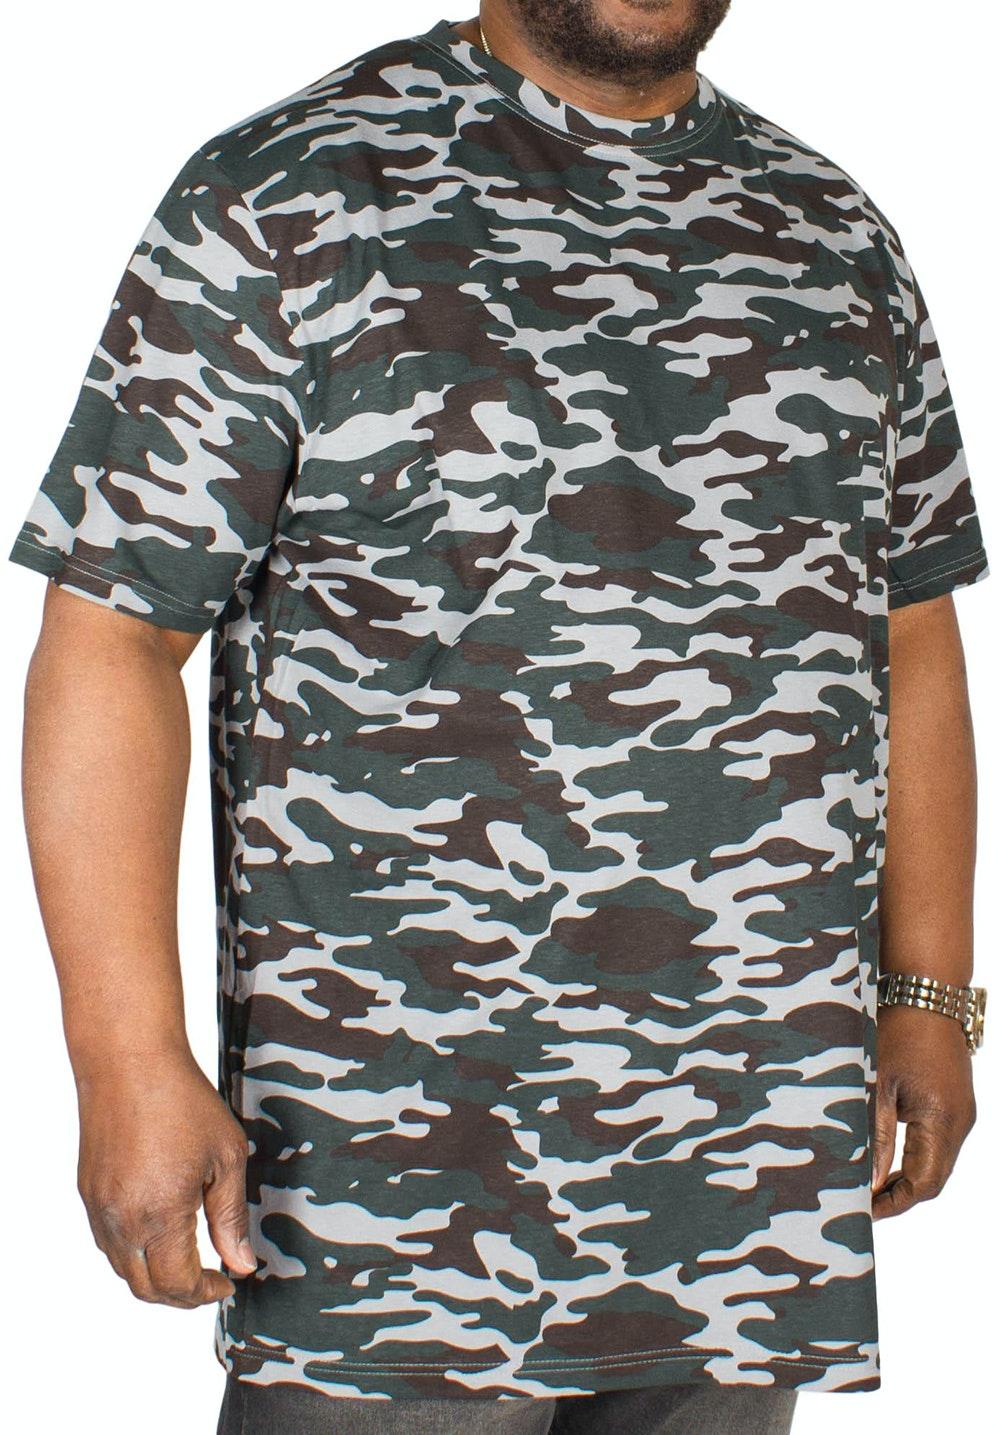 D555 Gaston Camouflage Print T-Shirt Grey